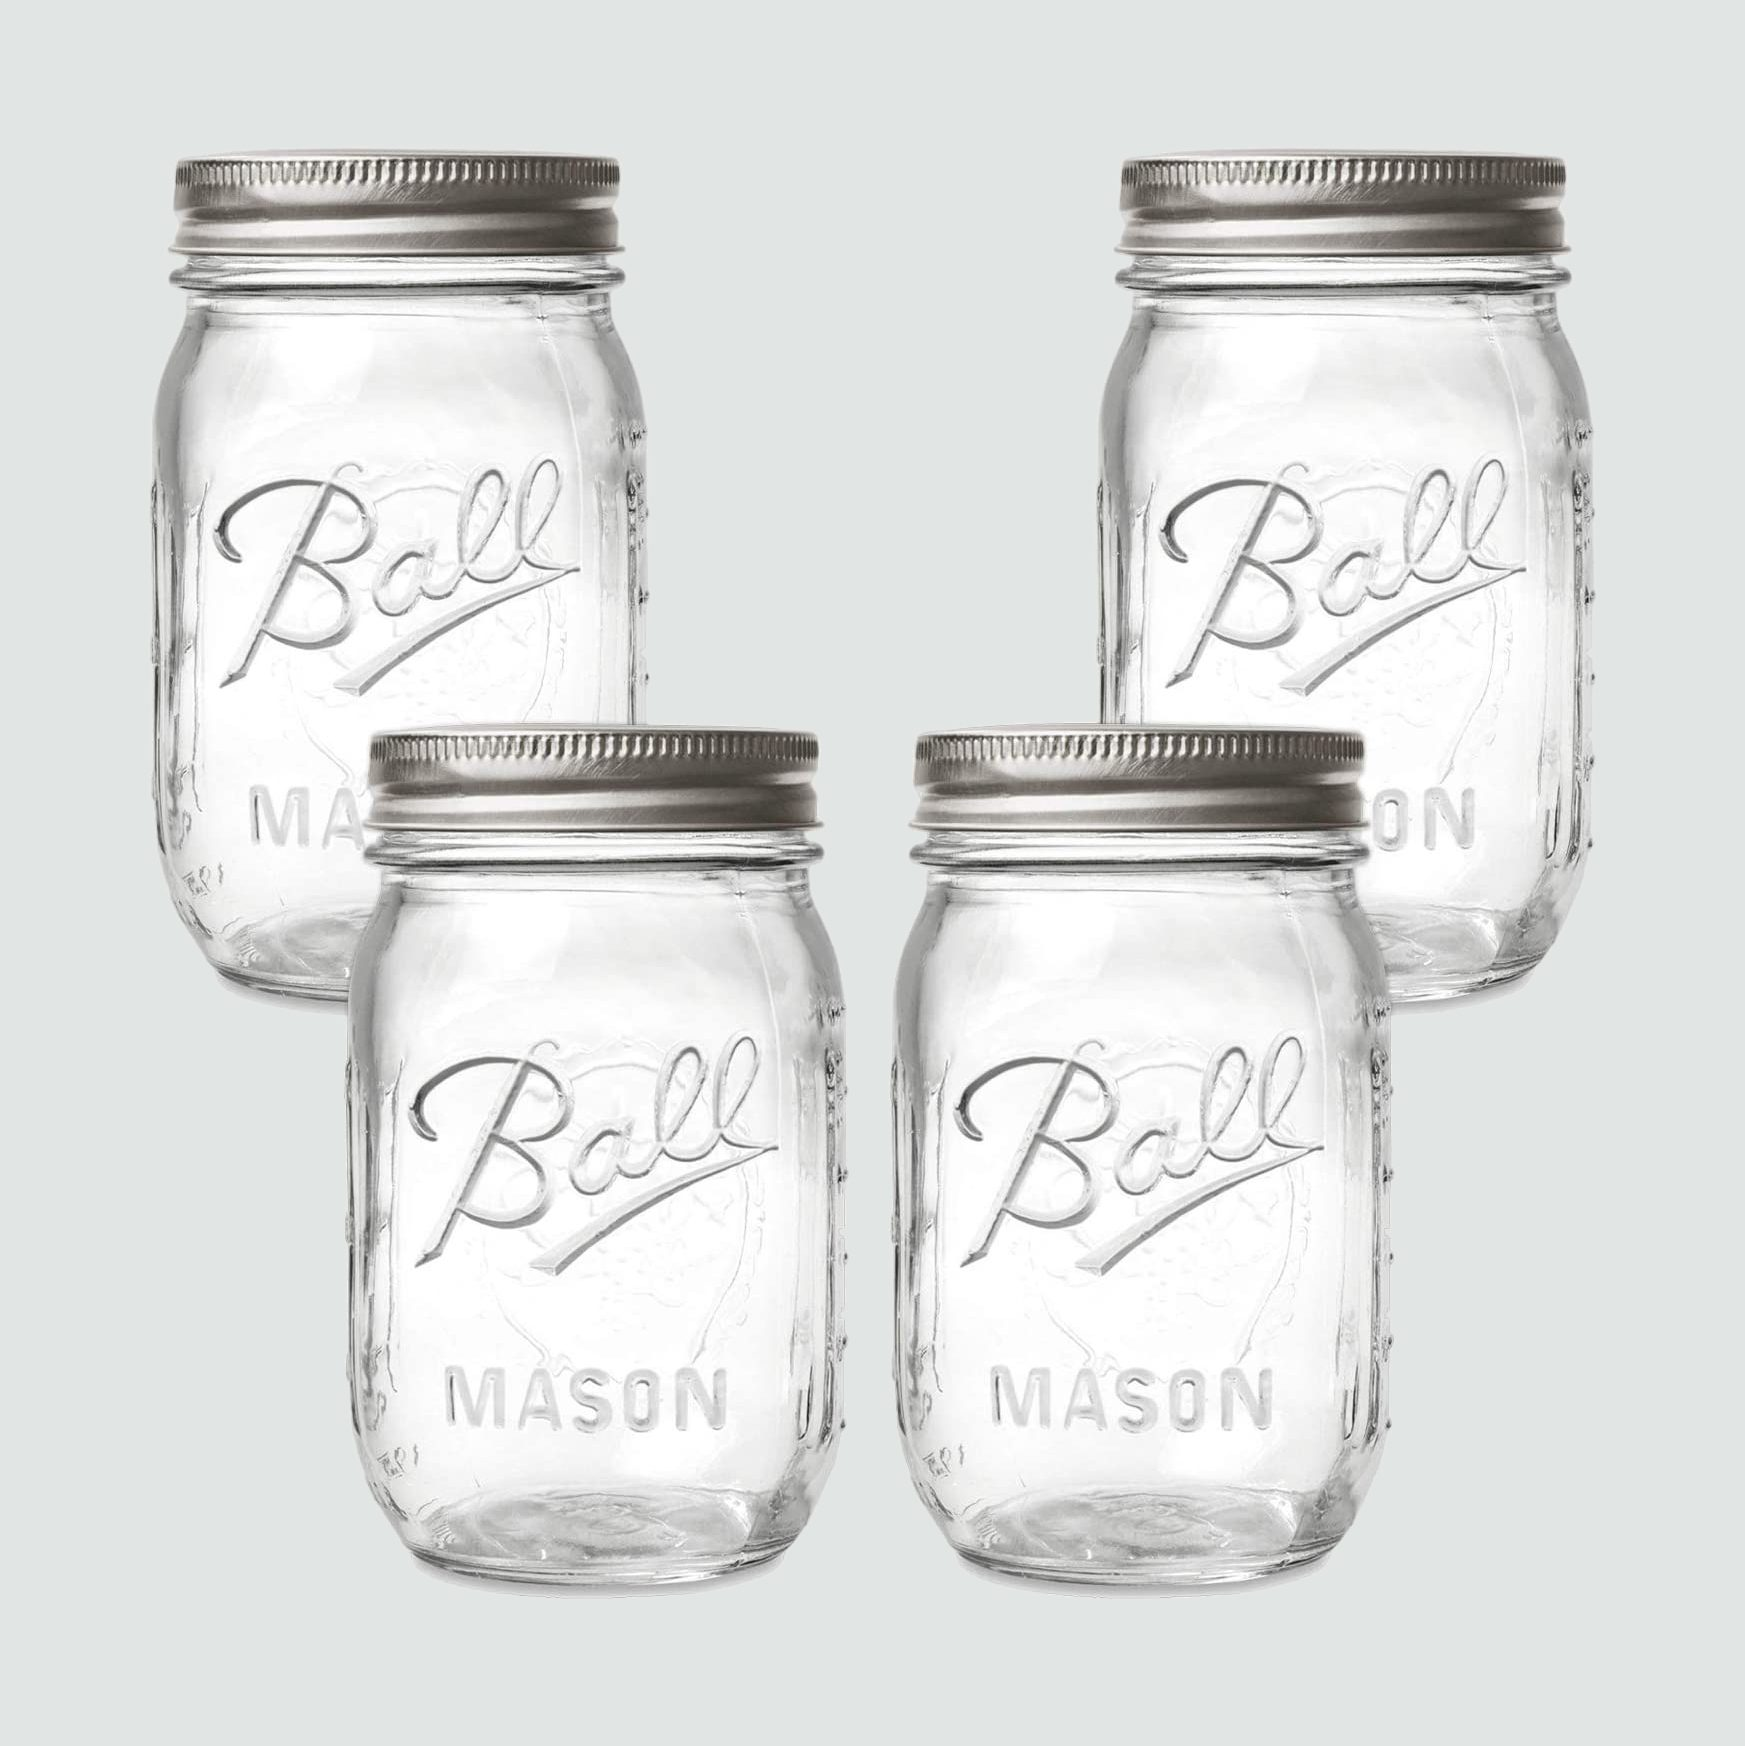 Ball Mason jars, 4 pack